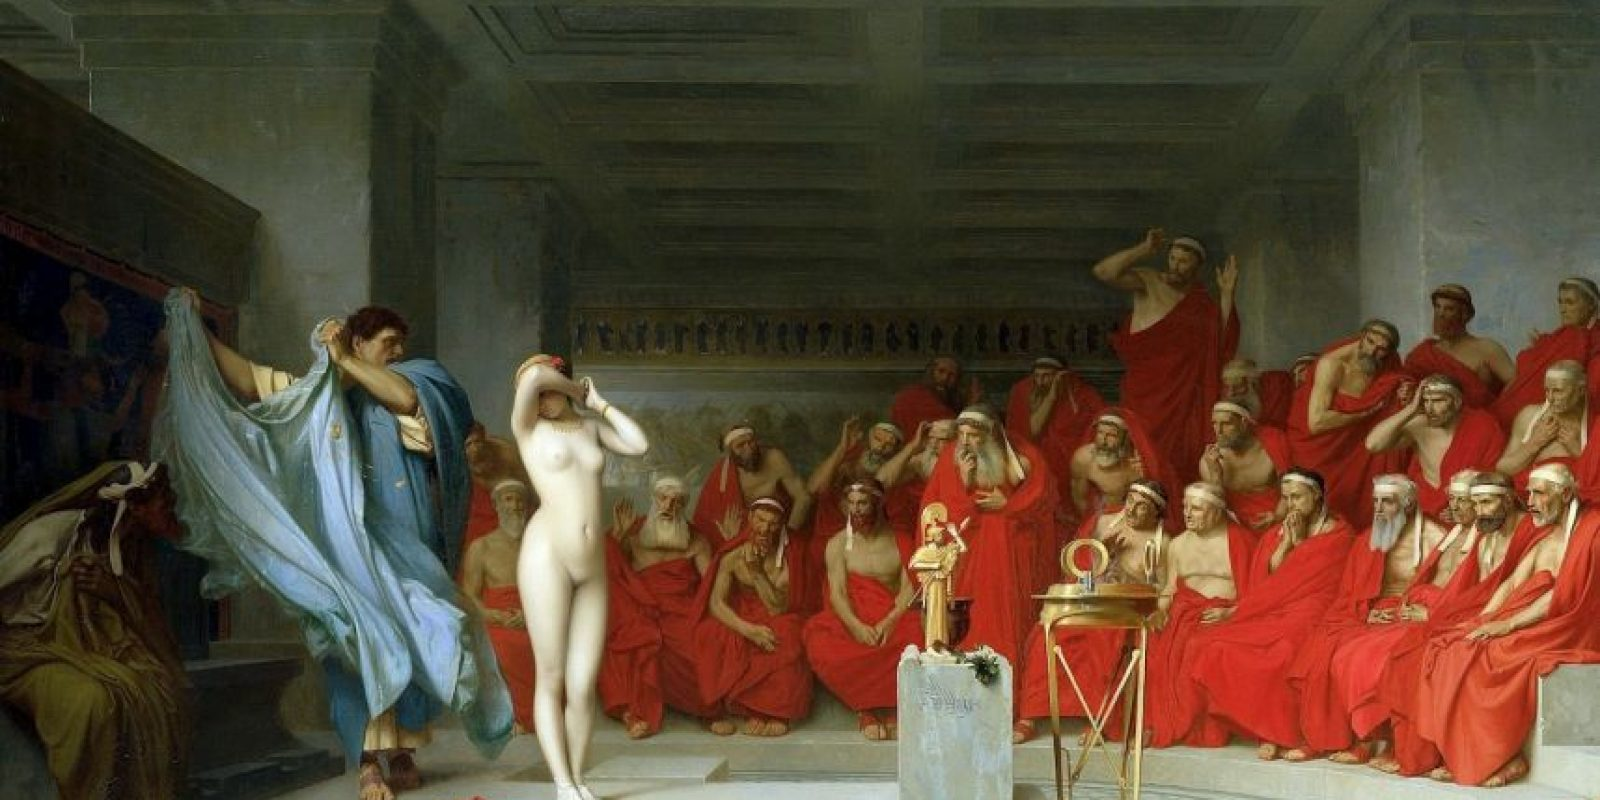 Friné, antigua Grecia. La desnudaron para defenderla ante un juicio por blasfemia. Foto:Wikipedia